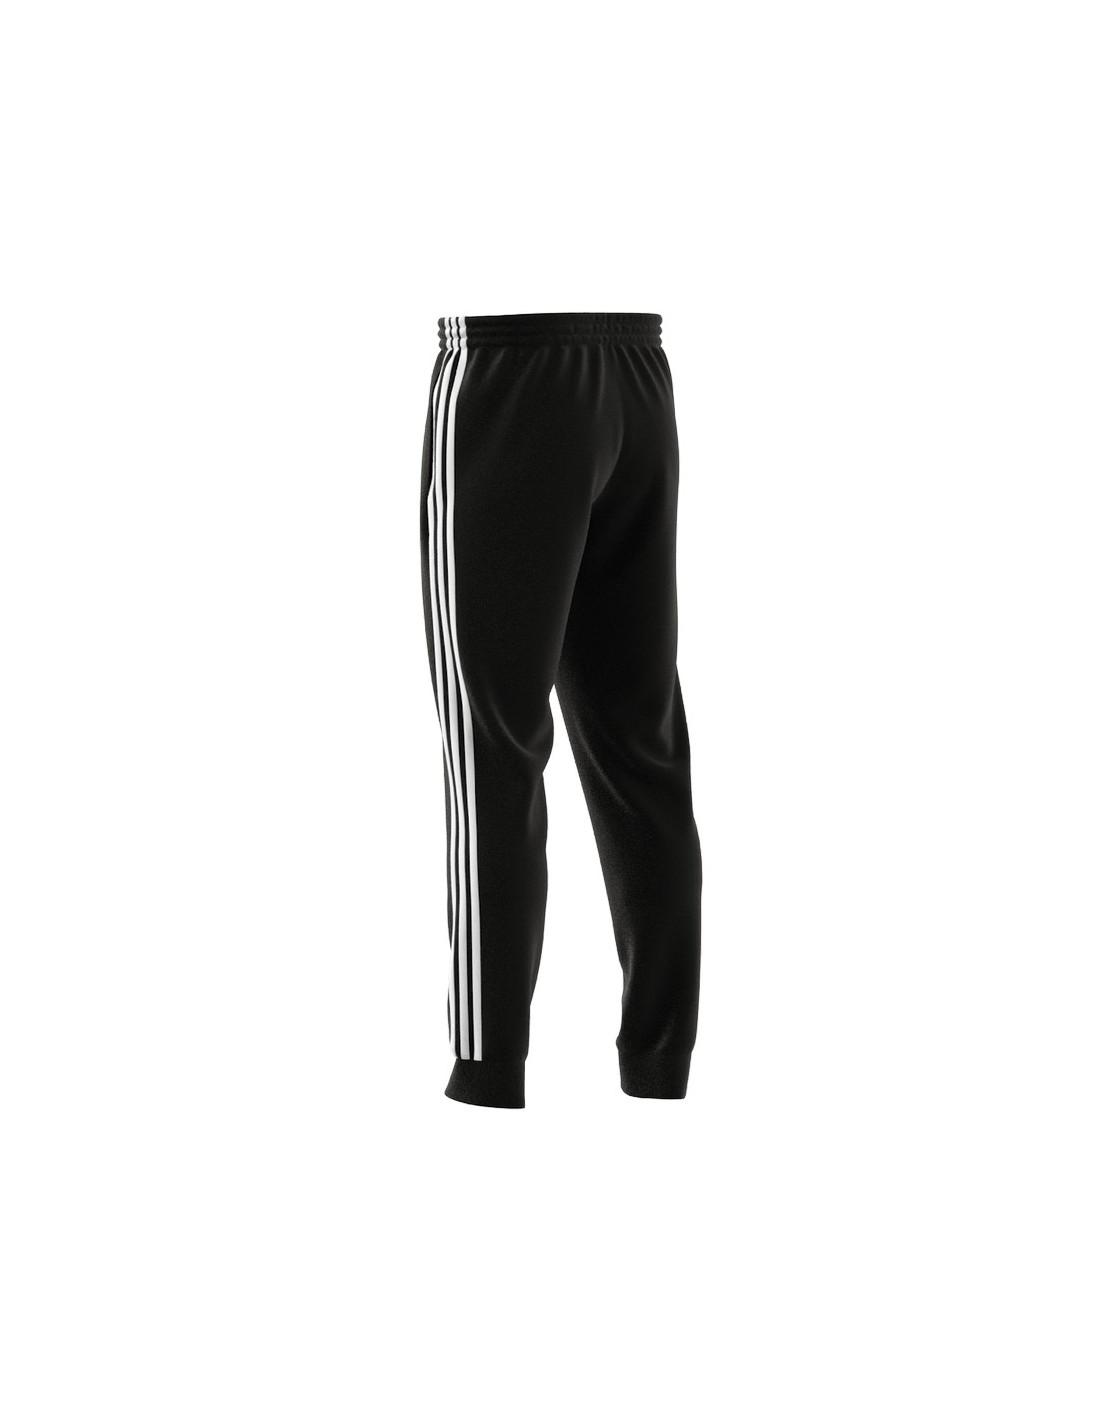 Camiseta FCBarcelona STADIUM 16-17 CLSC - TURINI 9e177a06edc